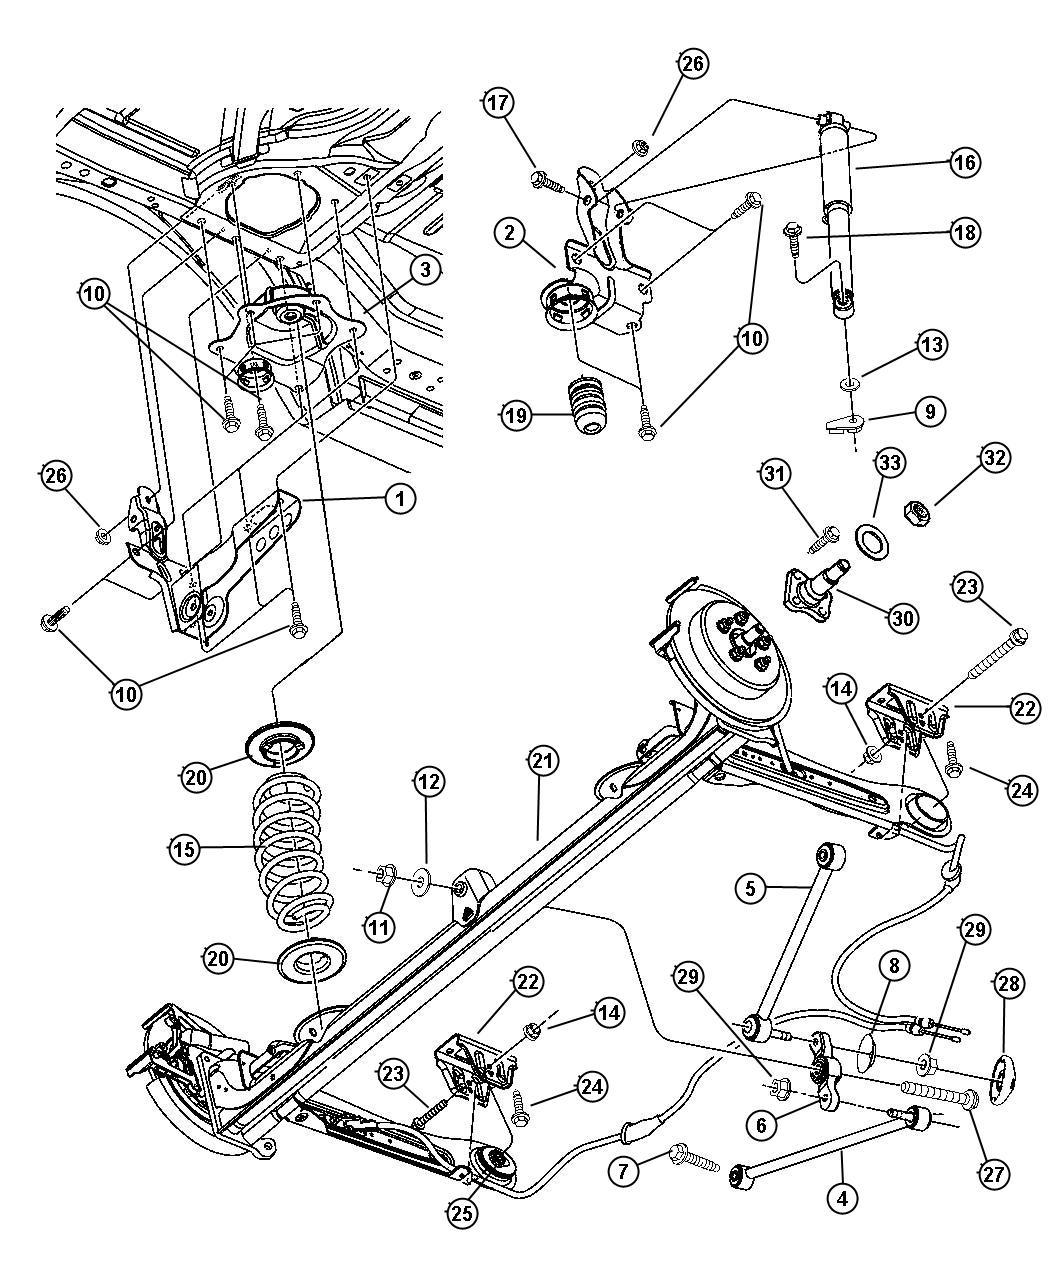 2003 Pt Cruiser Parts Diagram Detailed Schematic Diagrams Under Dash Fuse Box Example Electrical Wiring U2022 2006